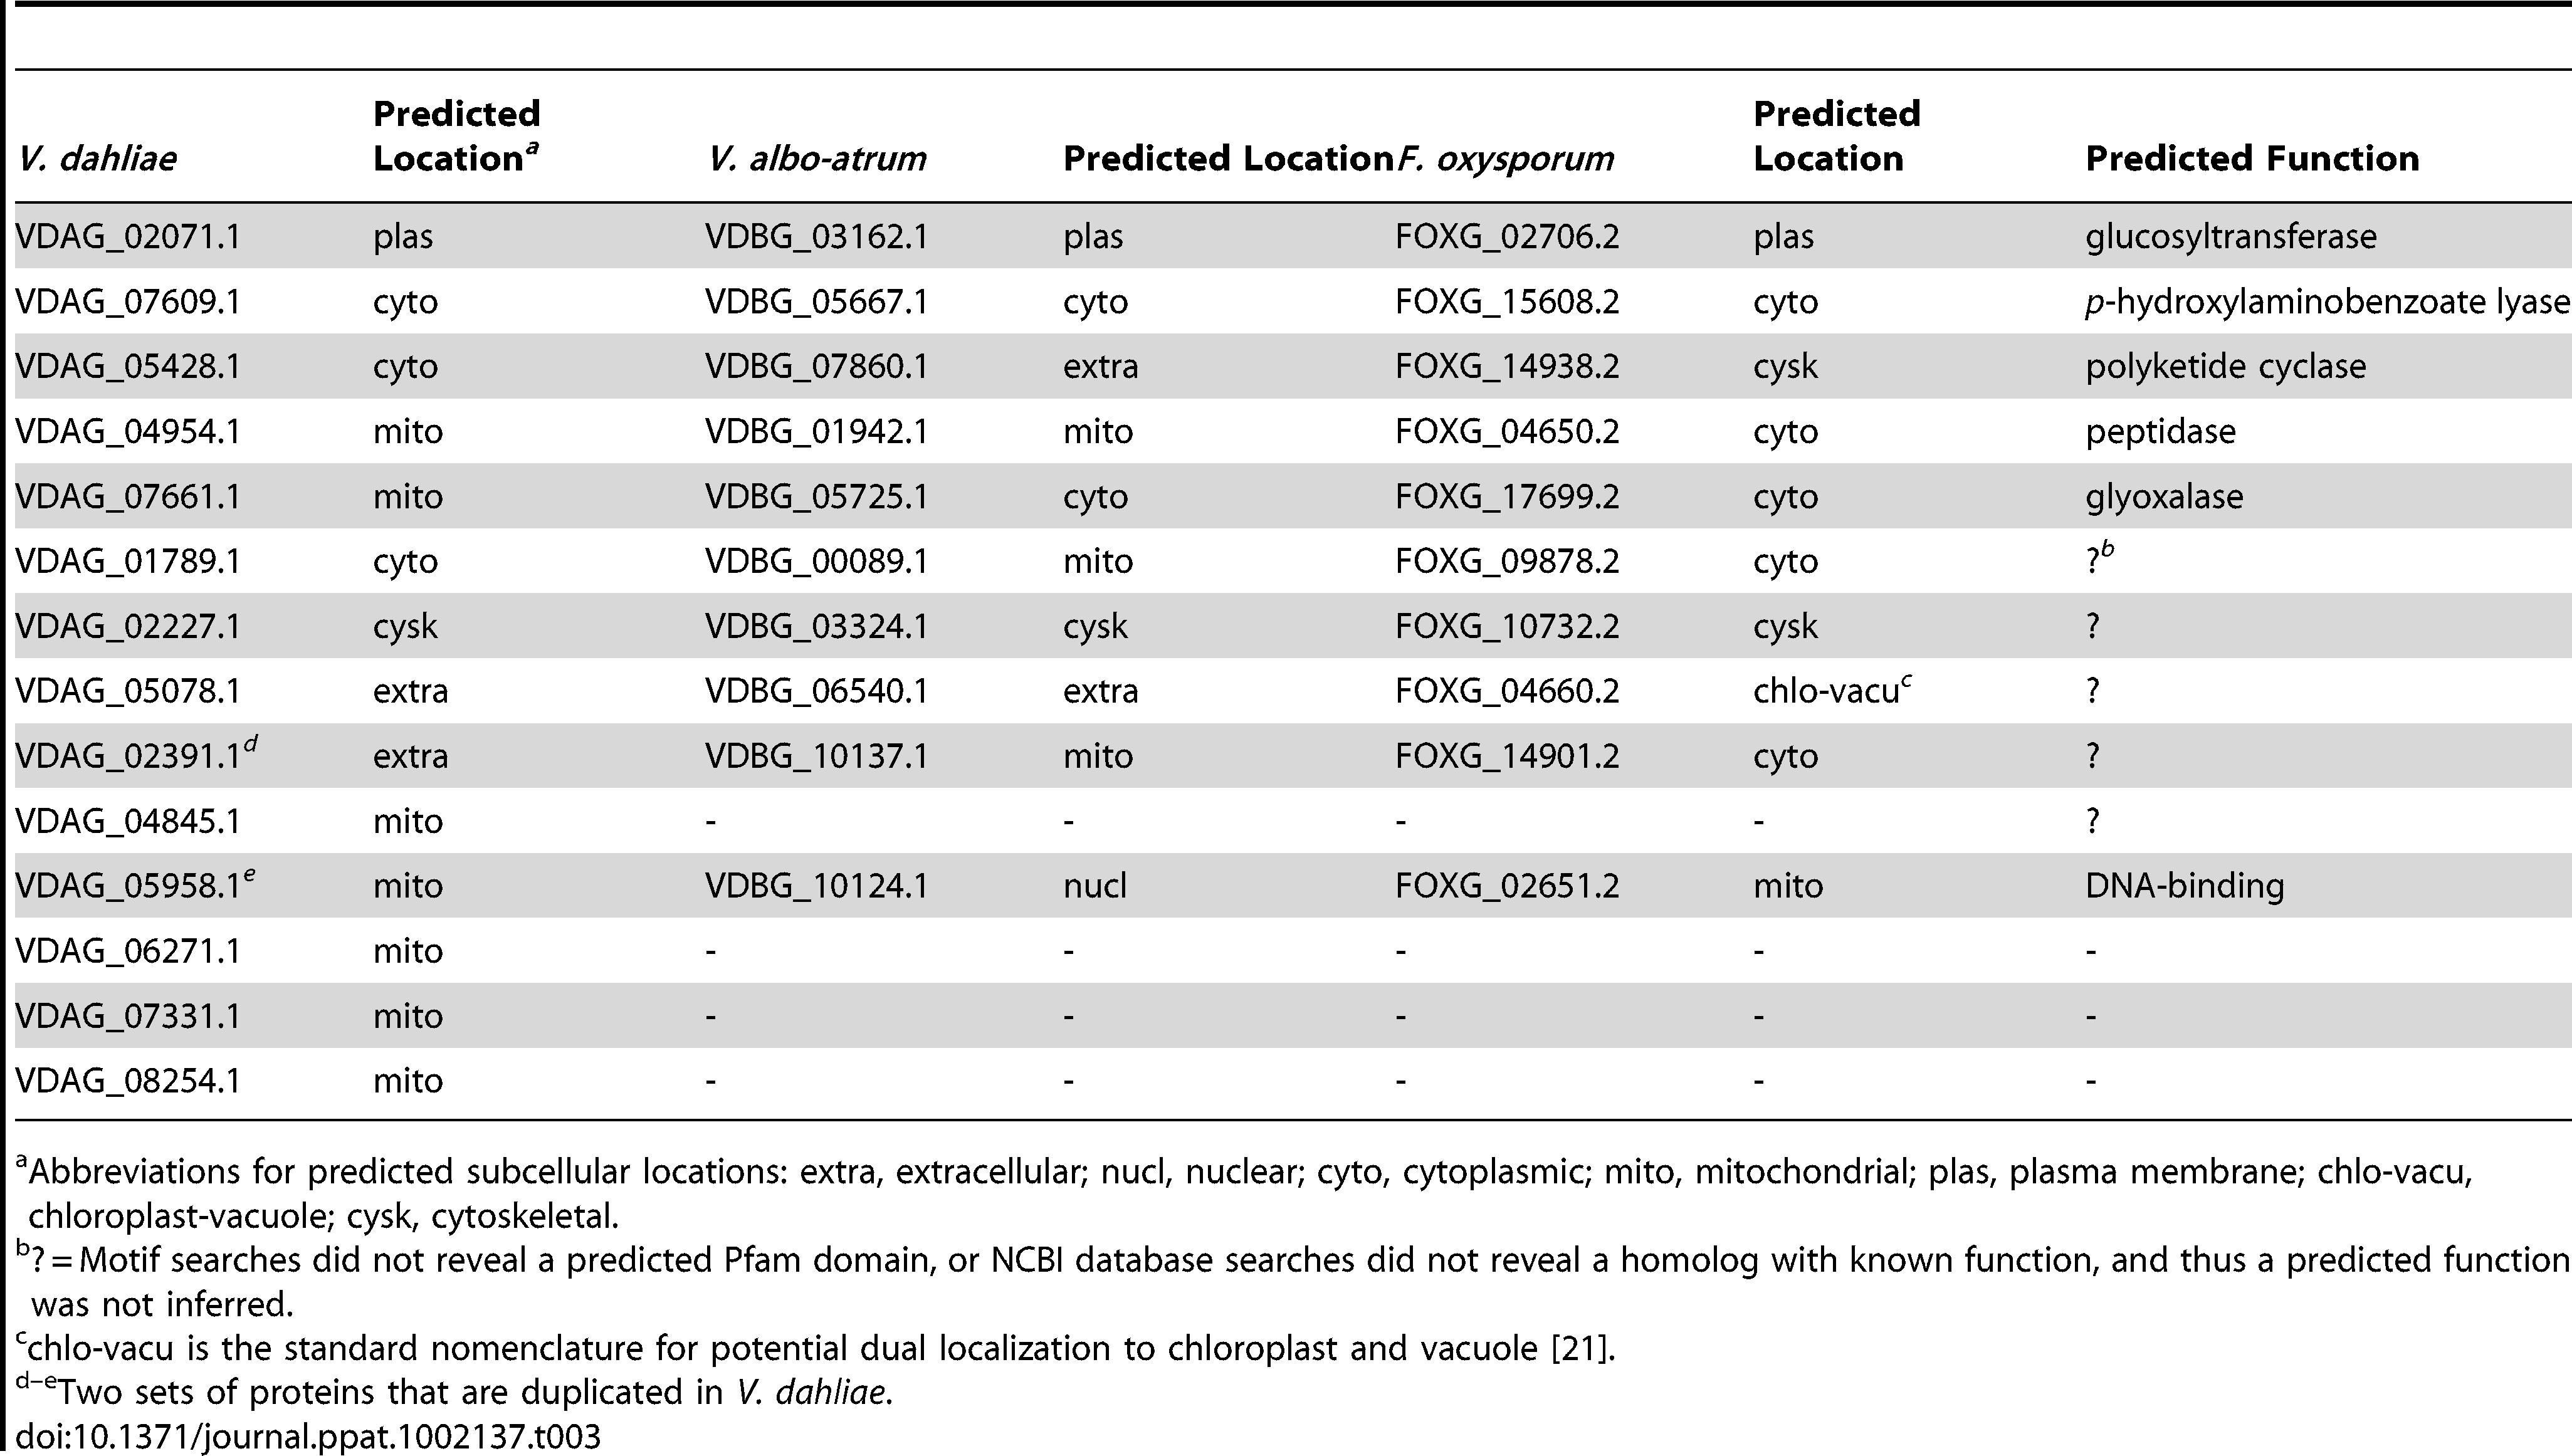 Predicted proteins present in <i>Vd</i>, <i>Vaa</i> and <i>F. oxysporum</i> but absent in <i>F. solani</i>, <i>F. graminearum</i>, and <i>F. verticilliodes</i>.